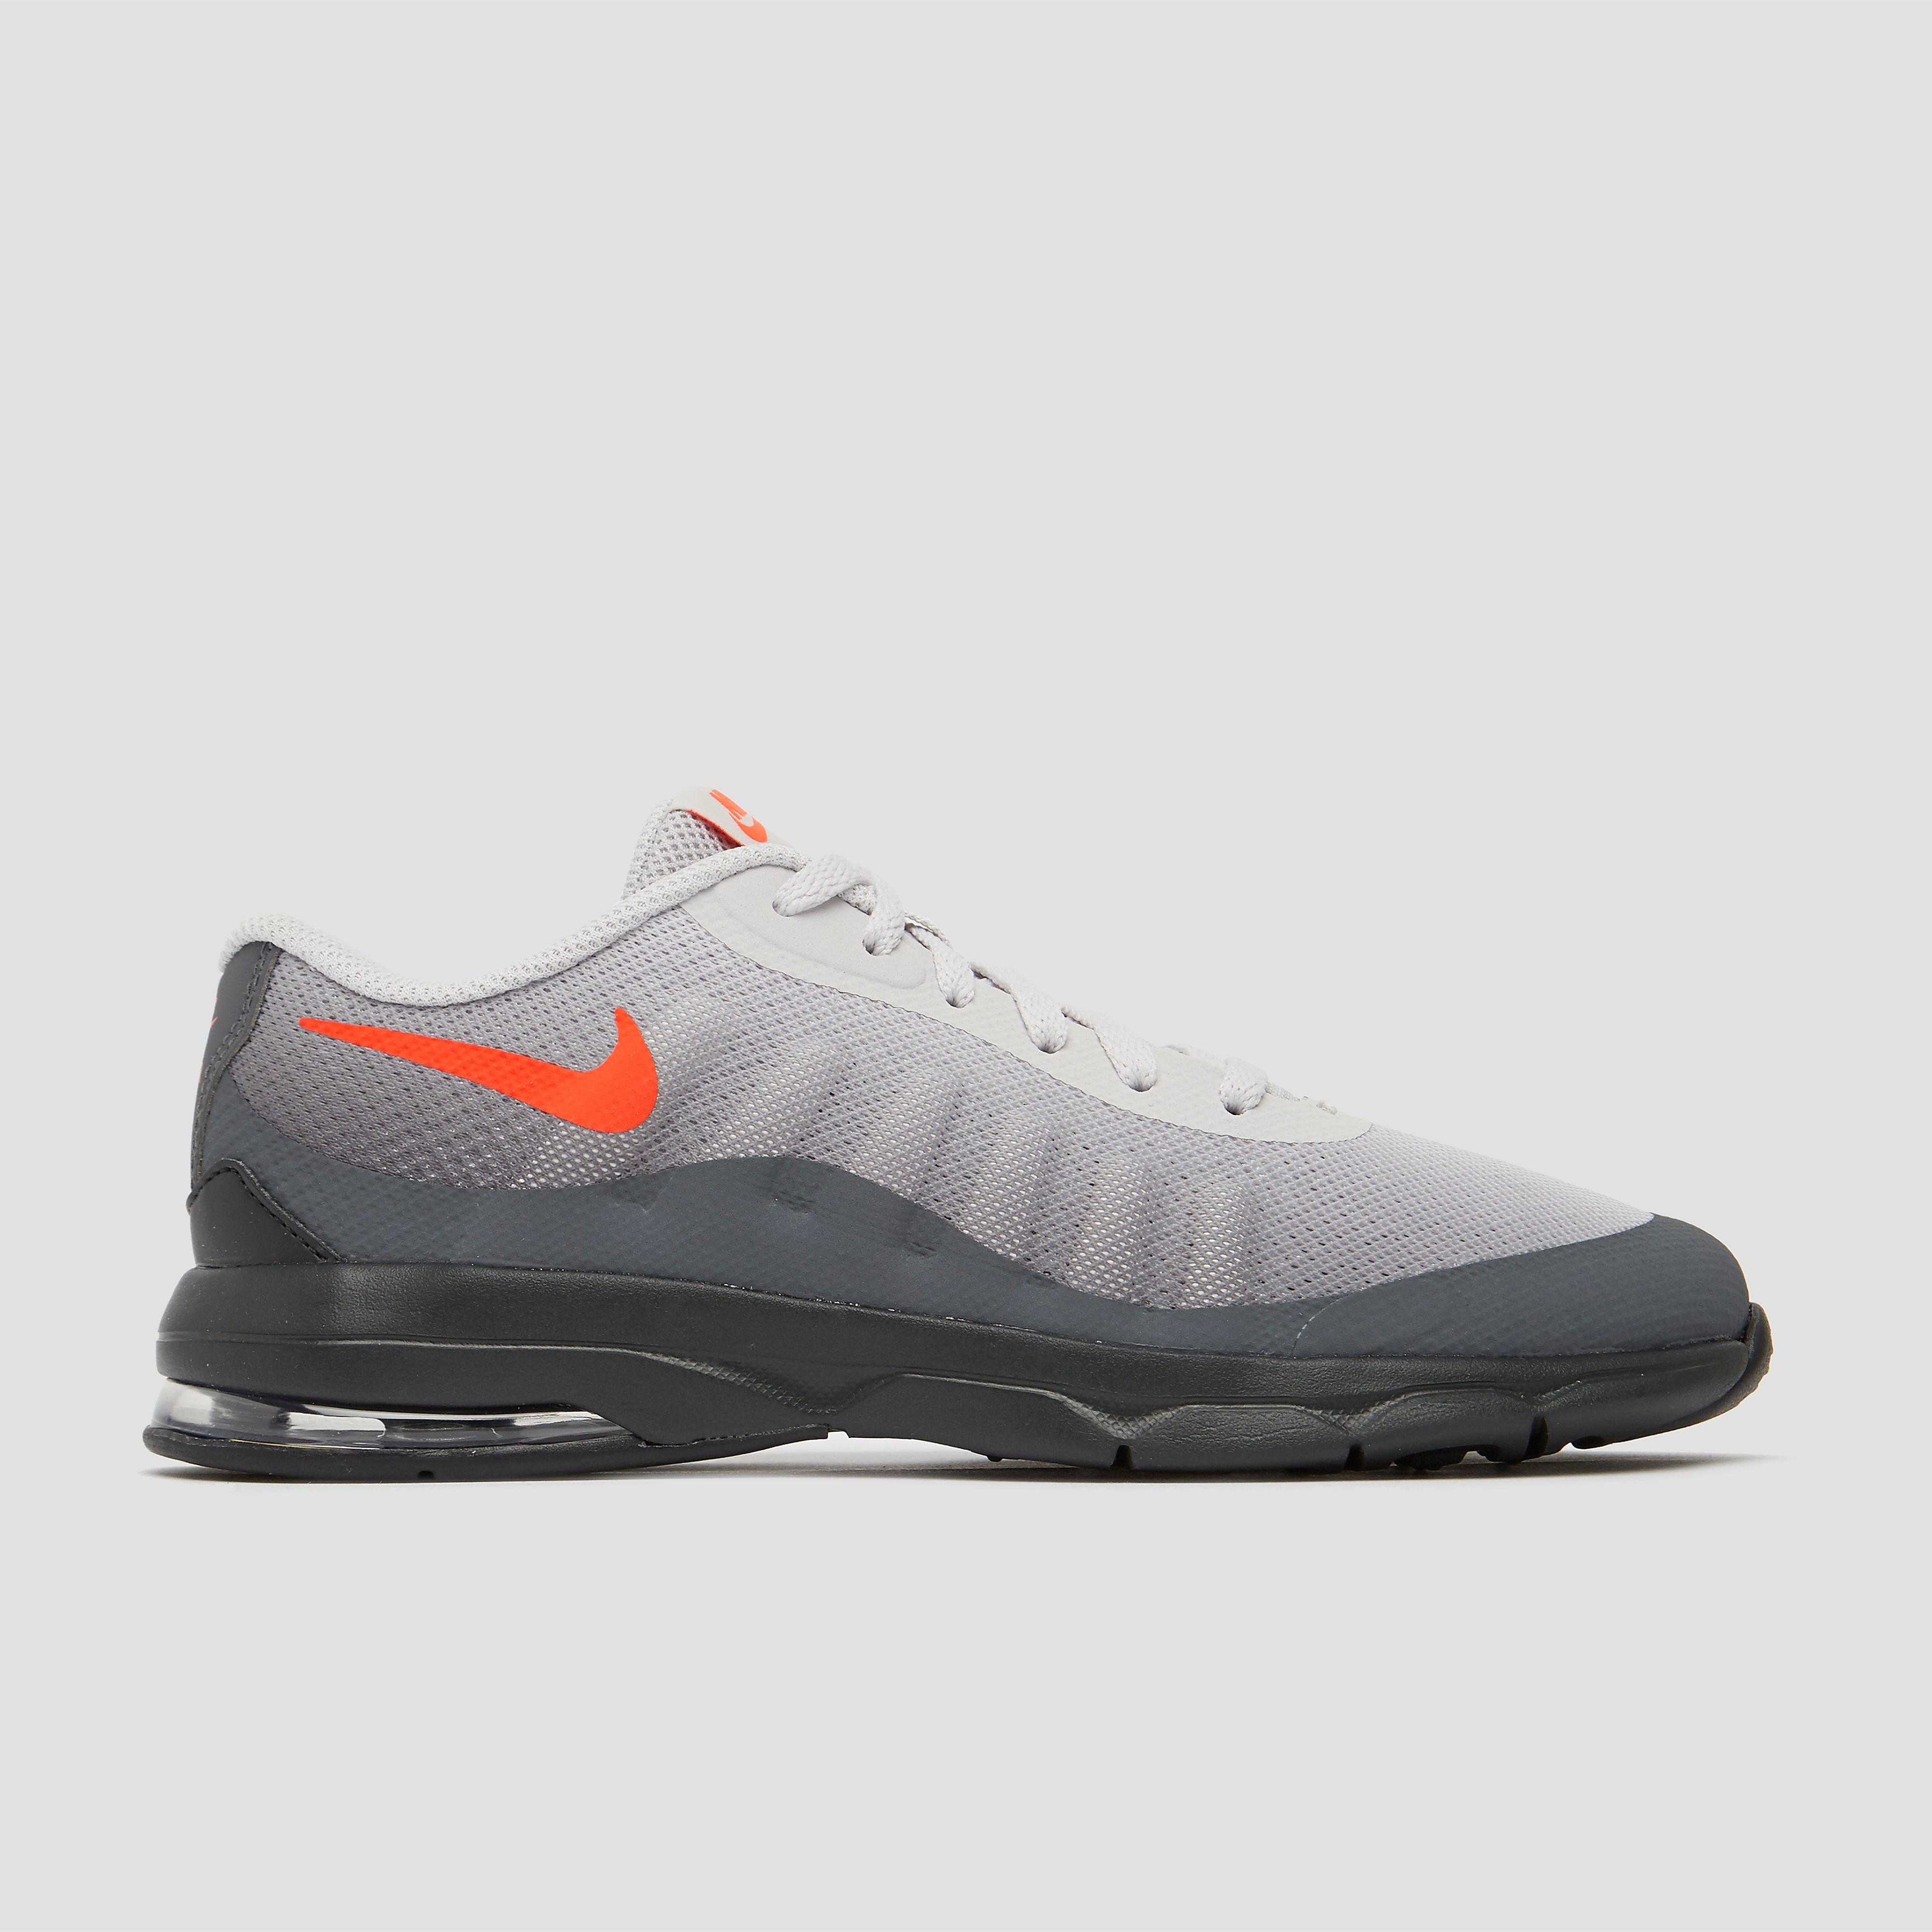 NIKE Air max invigor sneakers grijs/oranje kinderen Kinderen